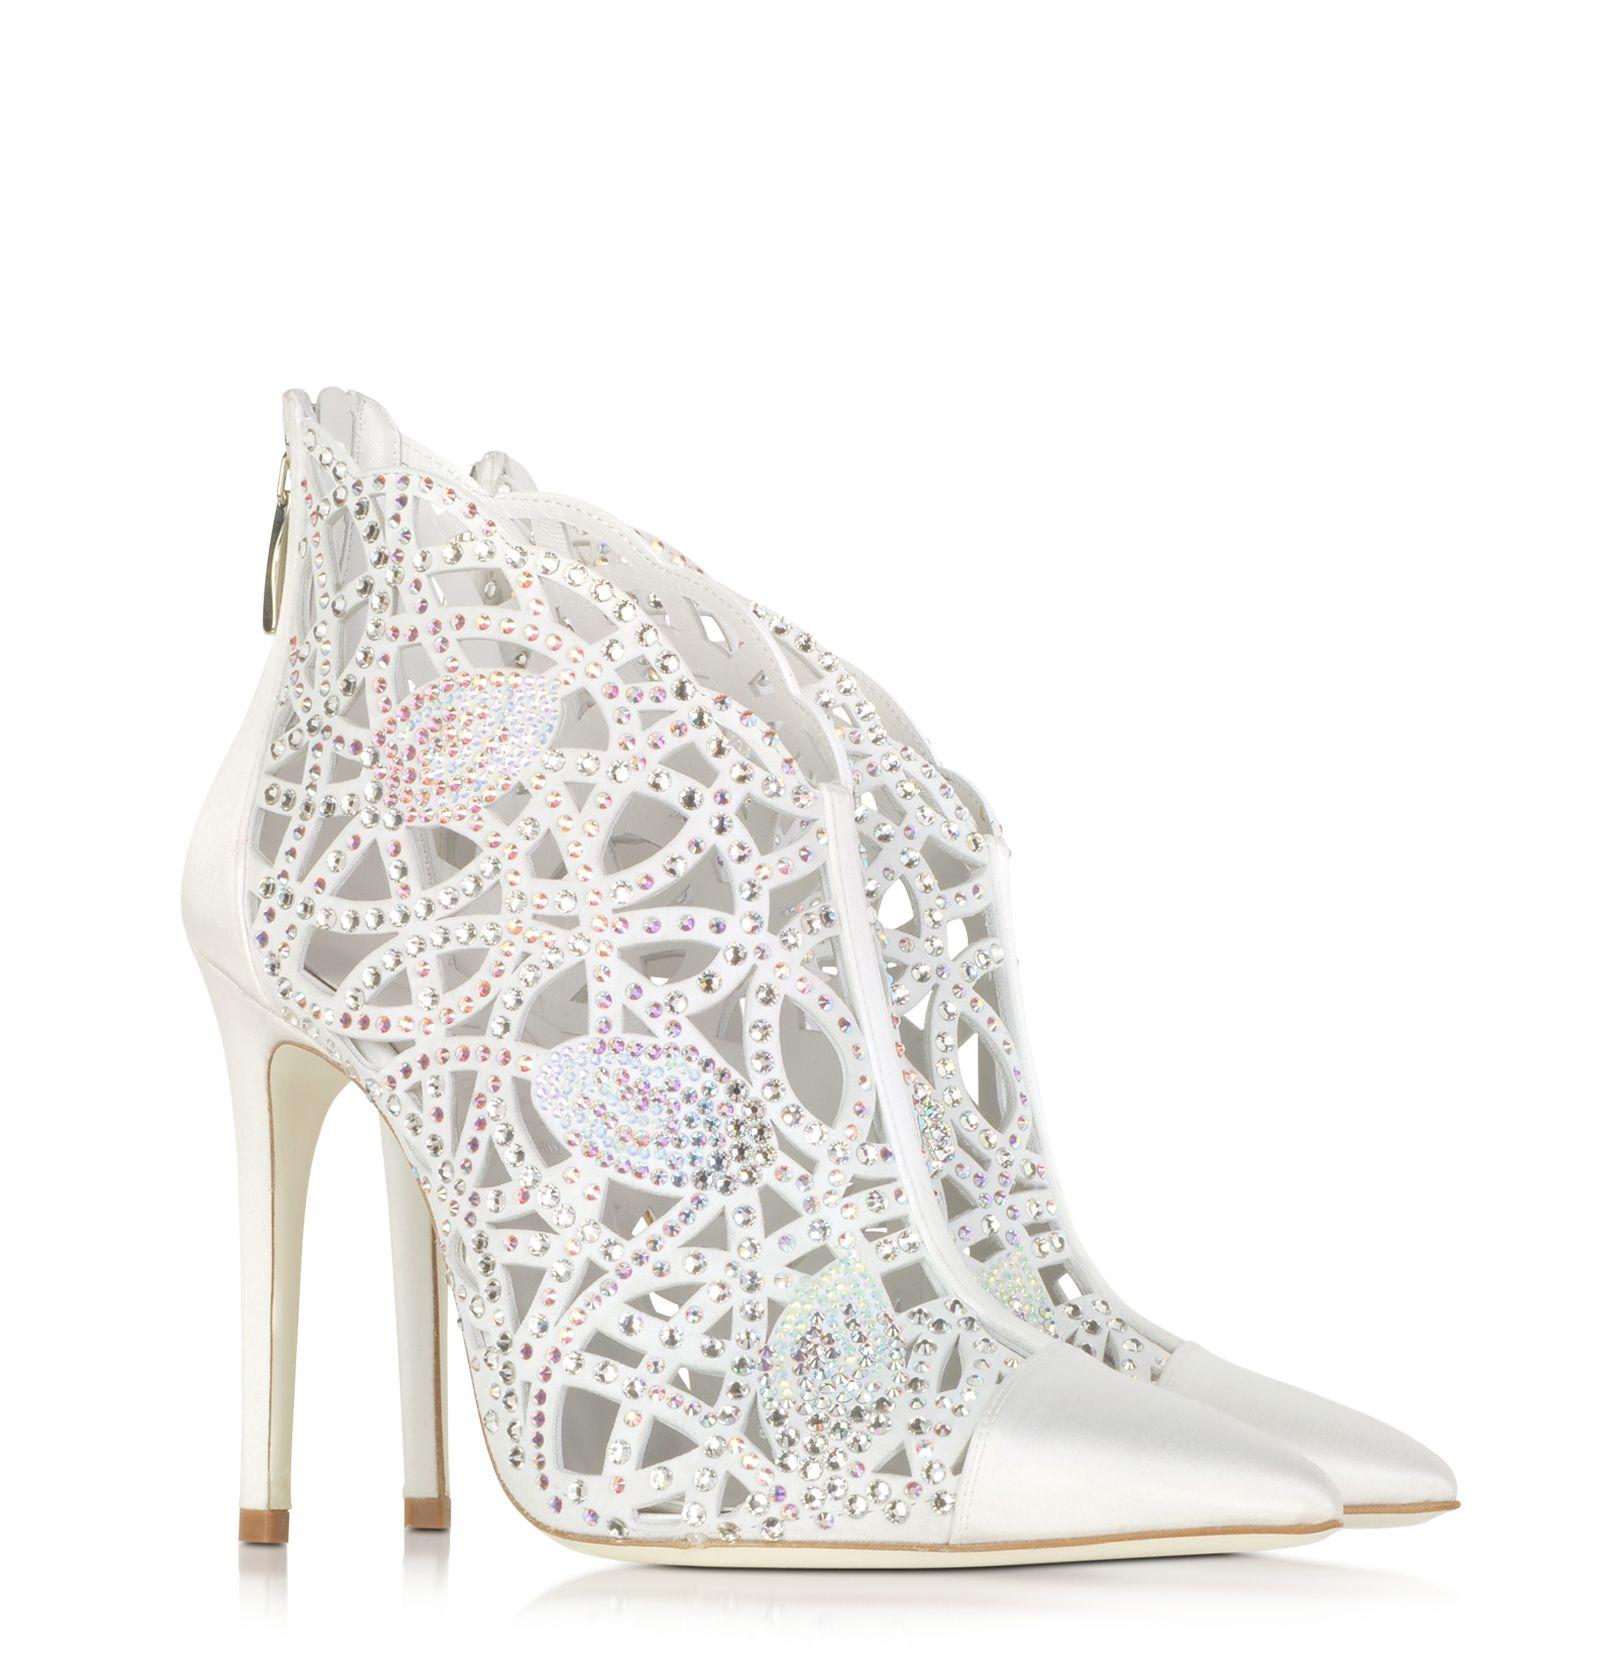 LORIBLU Designer Shoes, Satin Jewel Bootie